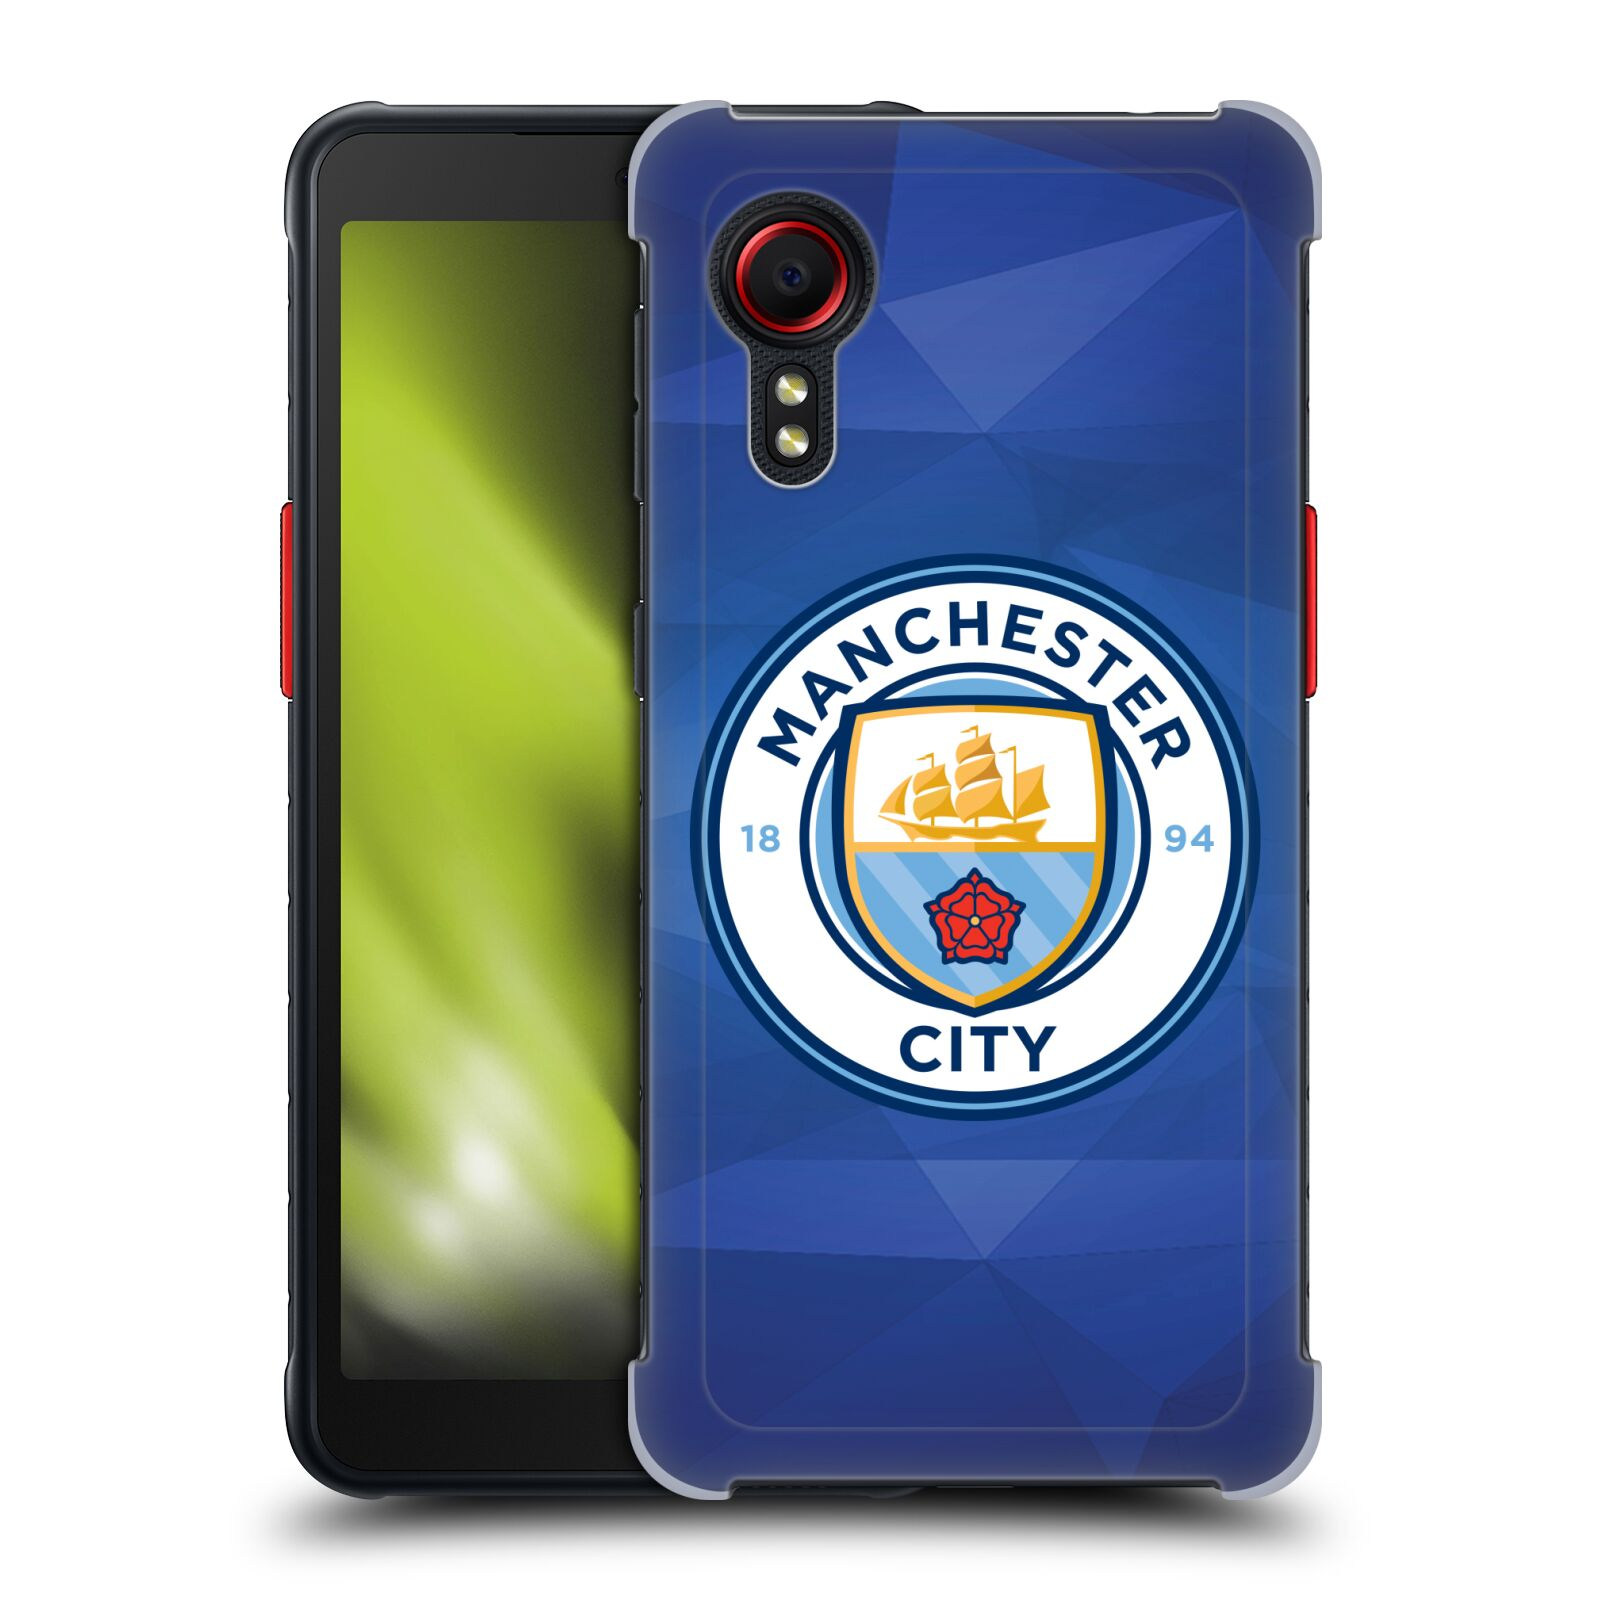 Plastové pouzdro na mobil Samsung Galaxy Xcover 5 - Head Case - Manchester City FC - Modré nové logo